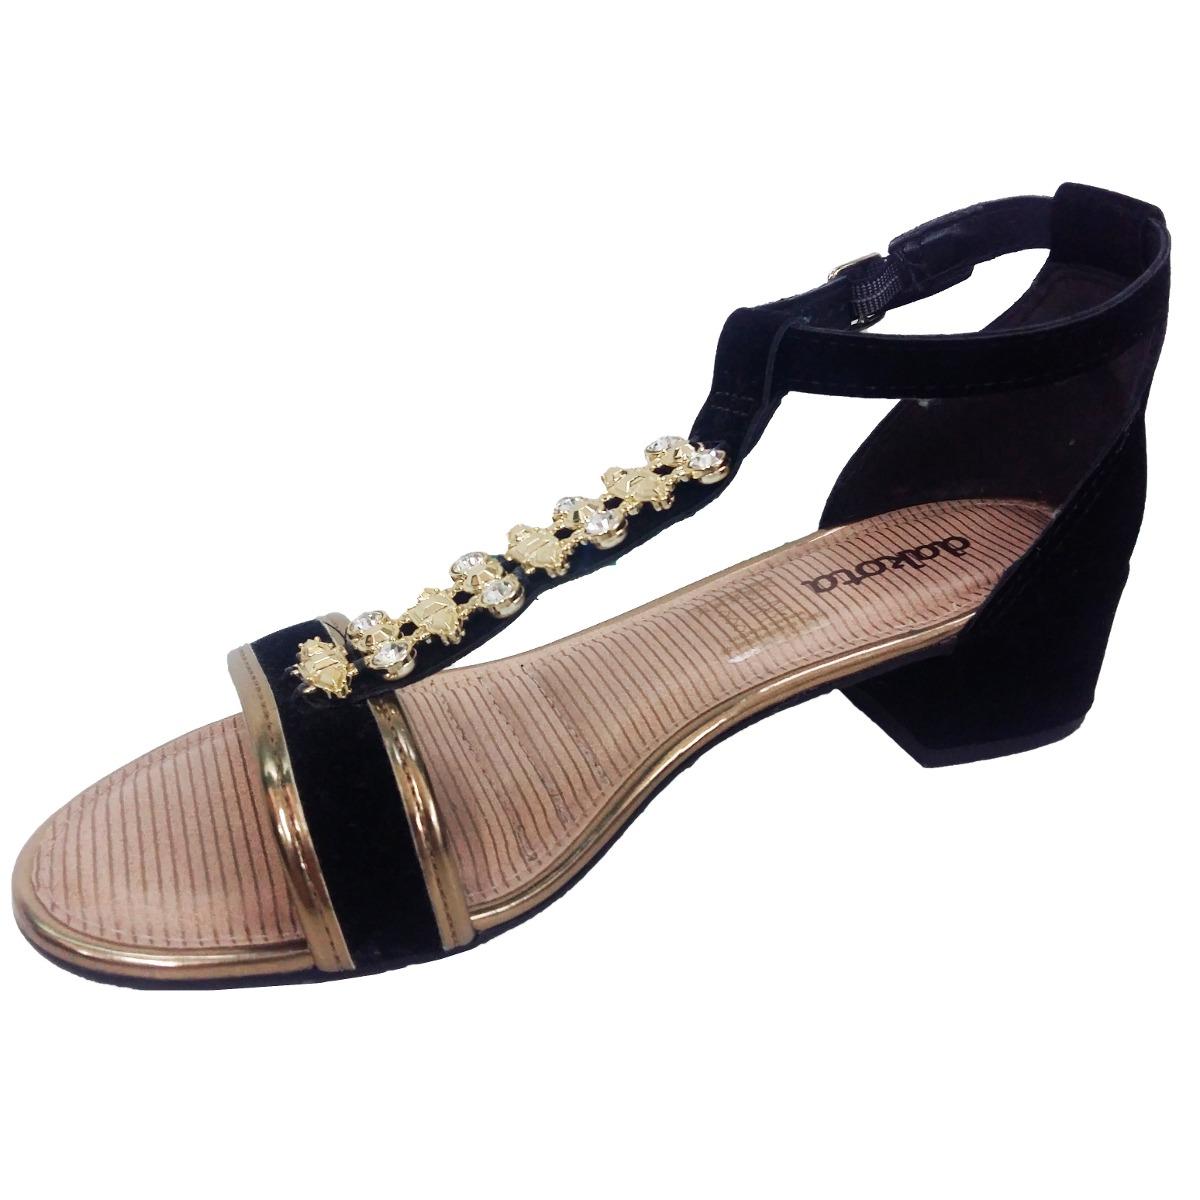 773861fe61 sandália feminina salto baixo preto ouro z1694 dakota. Carregando zoom.